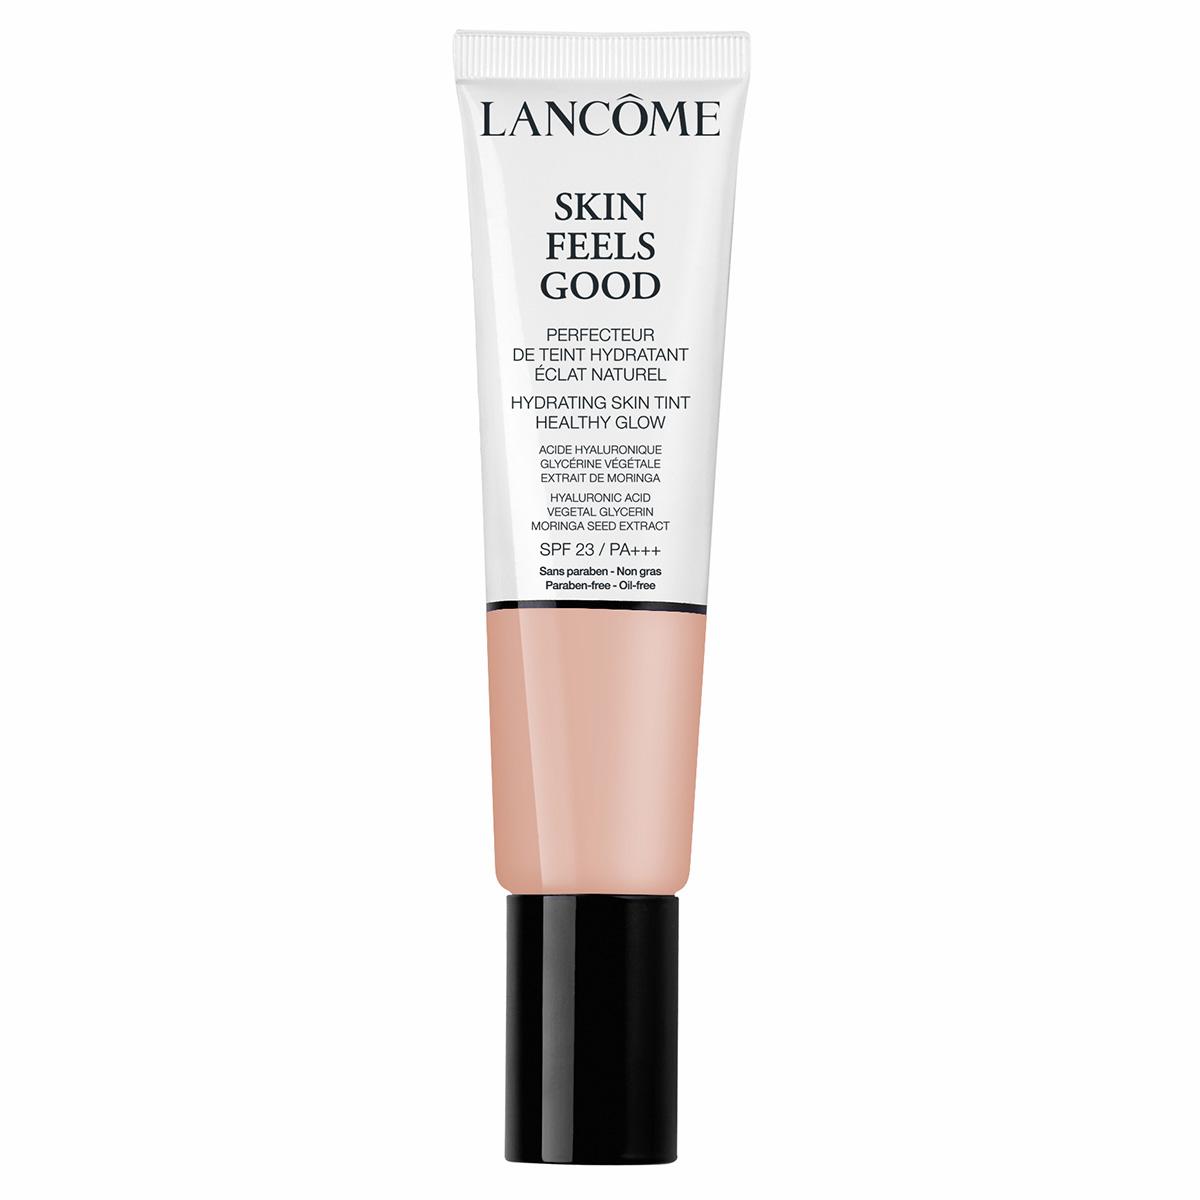 Lancôme - Skin Feels Good